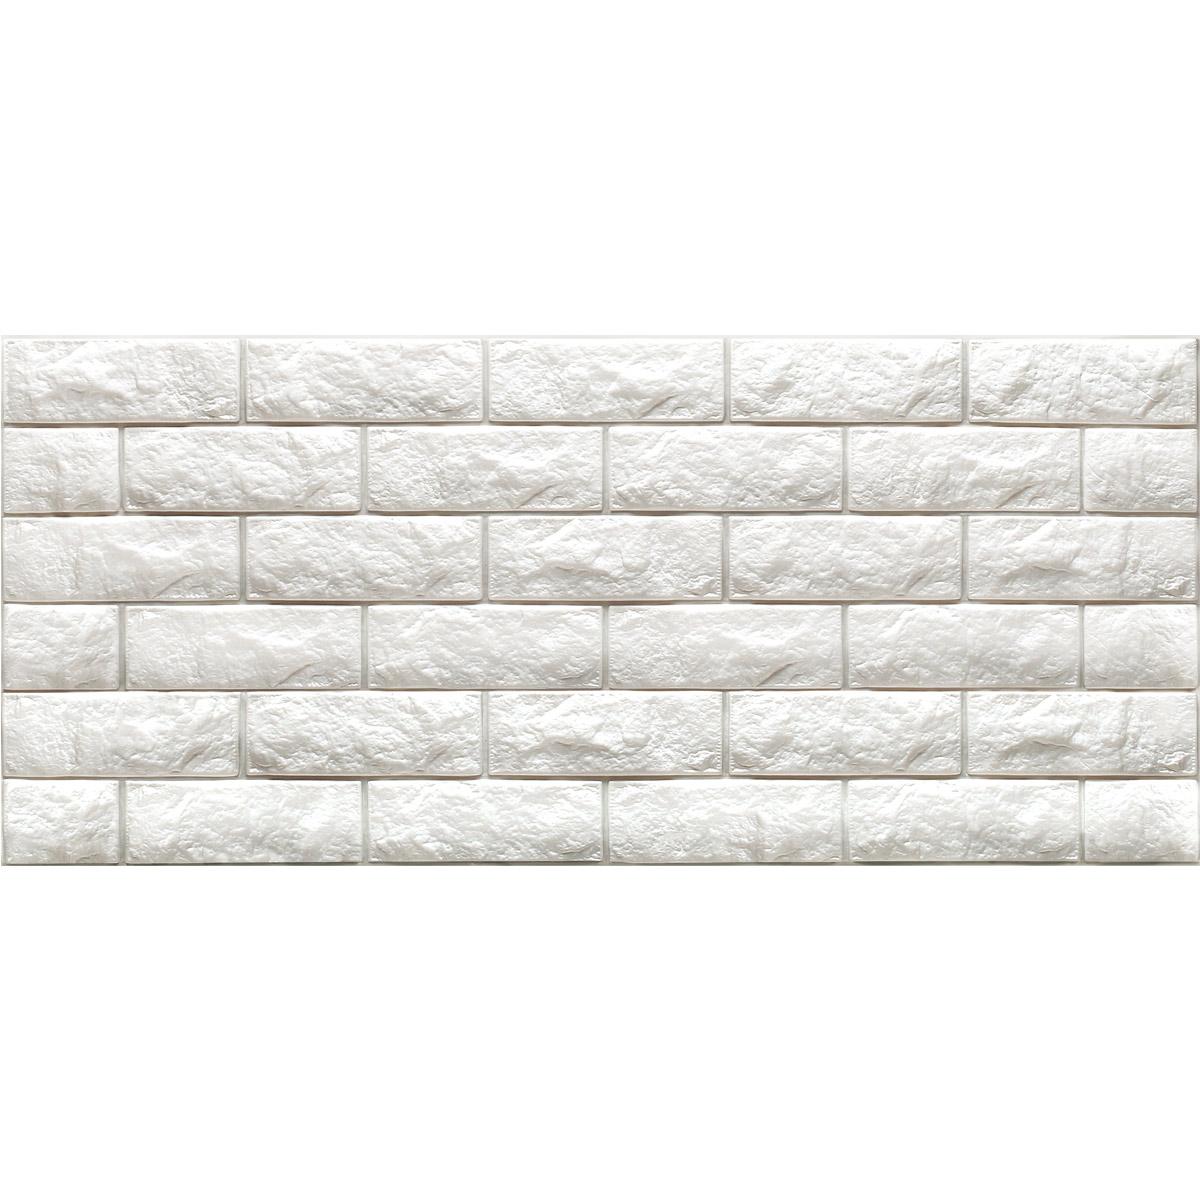 Peel amp Stick 3D Wall Panels Foam Block Brick Design 10